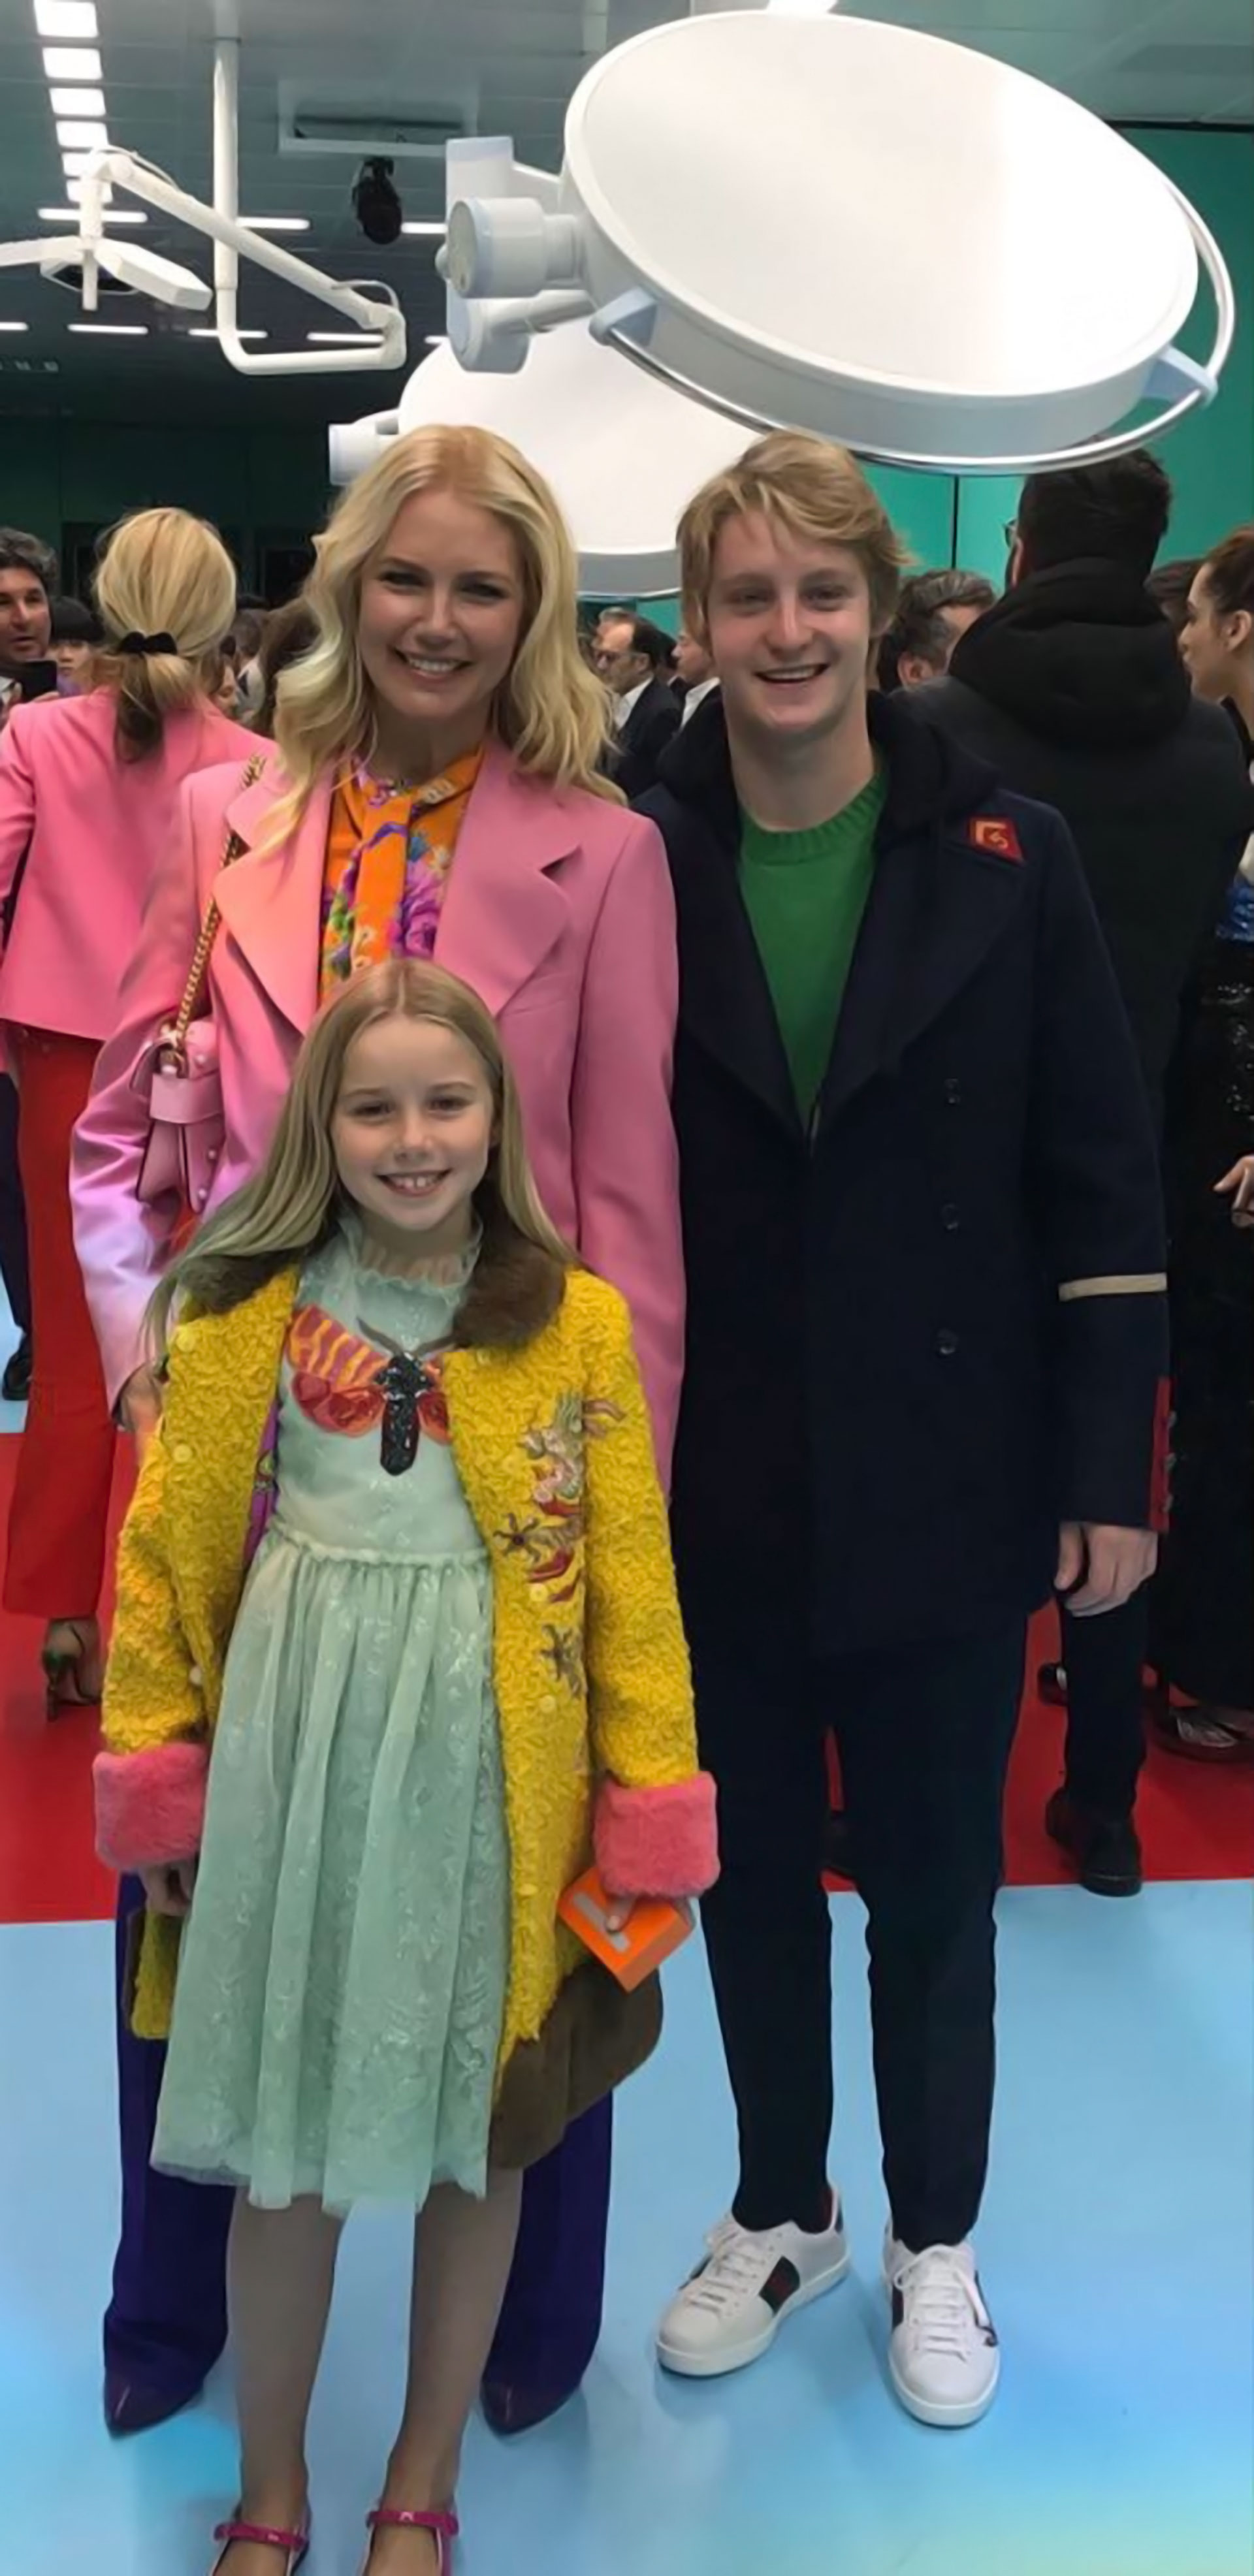 La familia fashionista, lookeados, siguiendo la línea de la boutique italiana